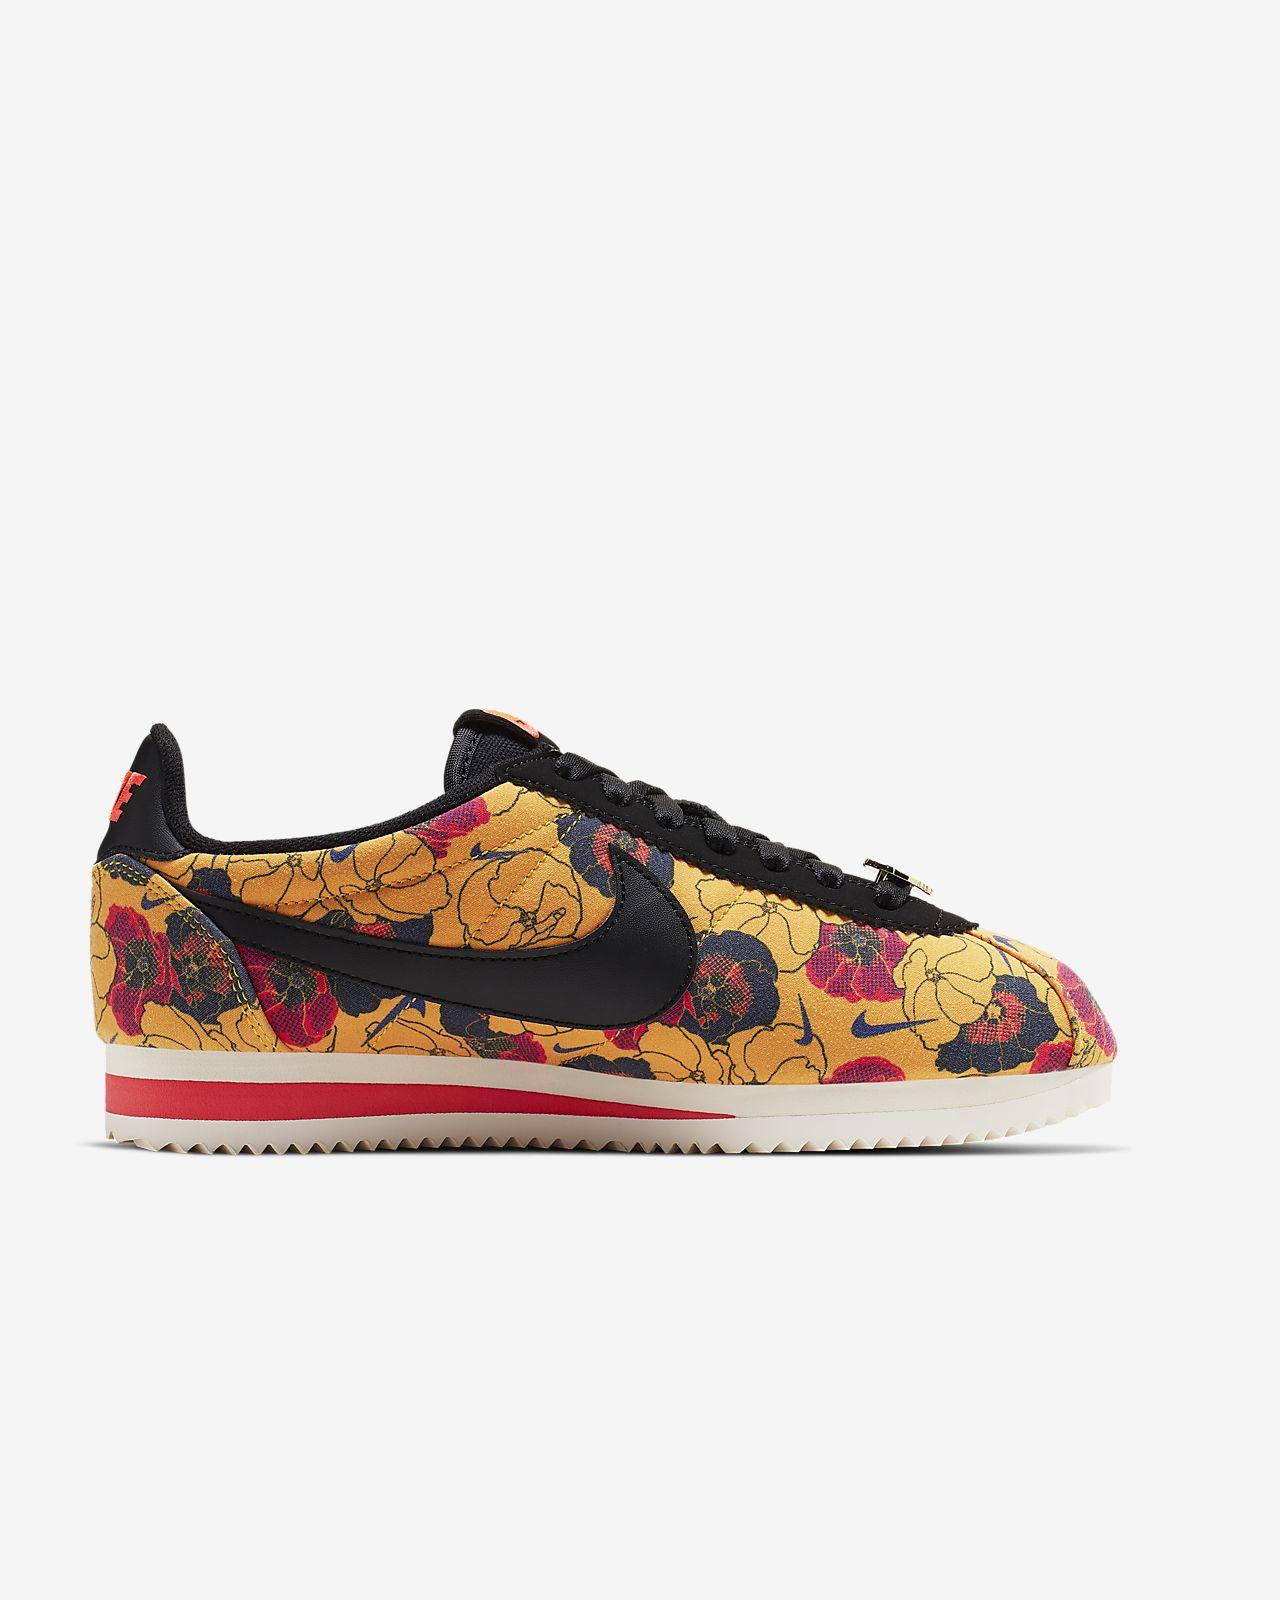 reputable site 1b5b6 545e0 ... Sko Nike Classic Cortez LX för kvinnor